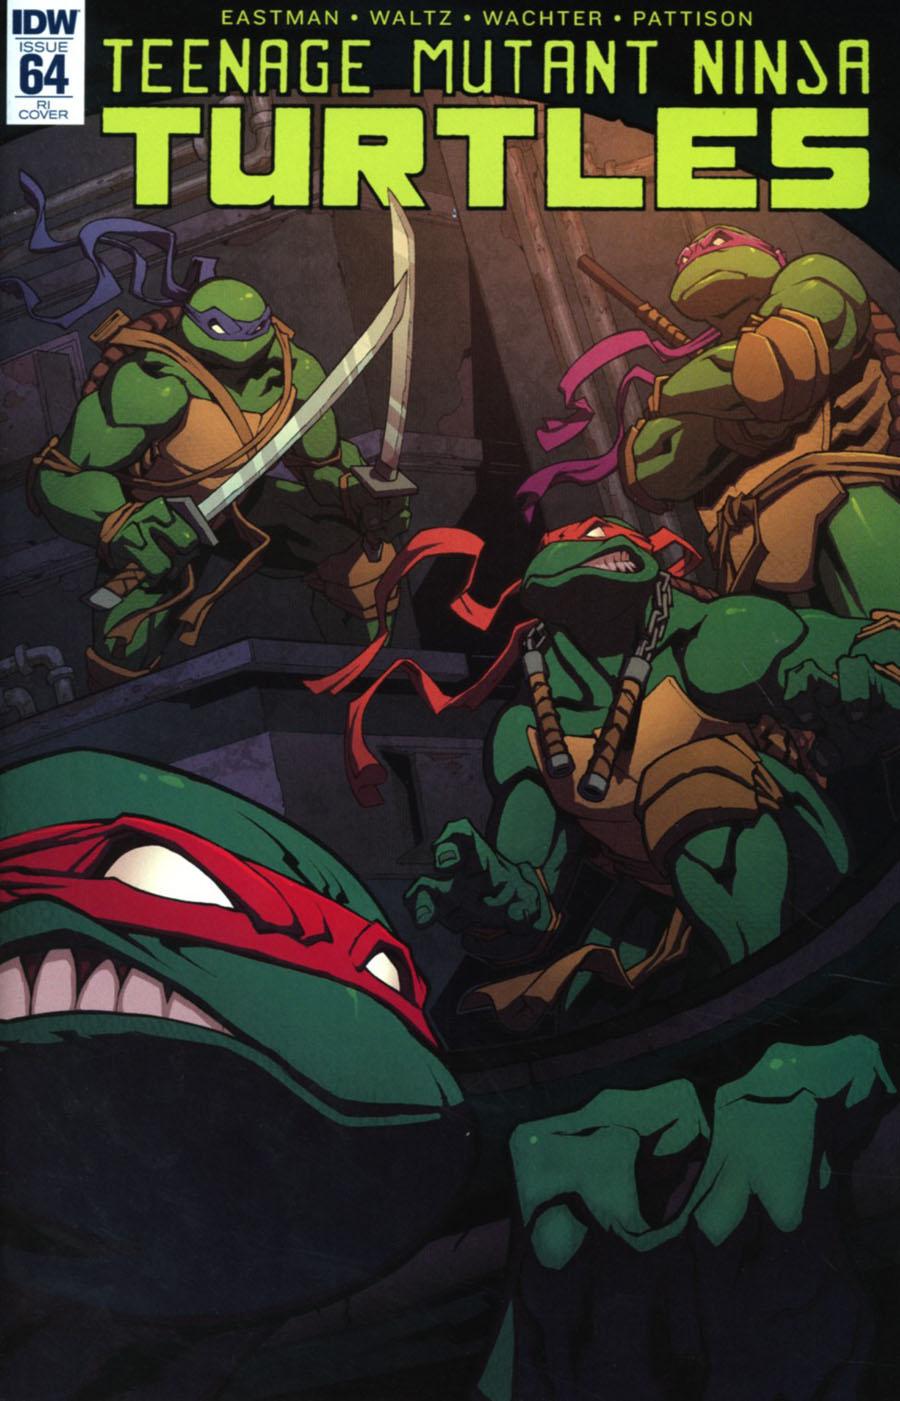 Teenage Mutant Ninja Turtles Vol 5 #64 Cover C Incentive Edwin Huang Variant Cover